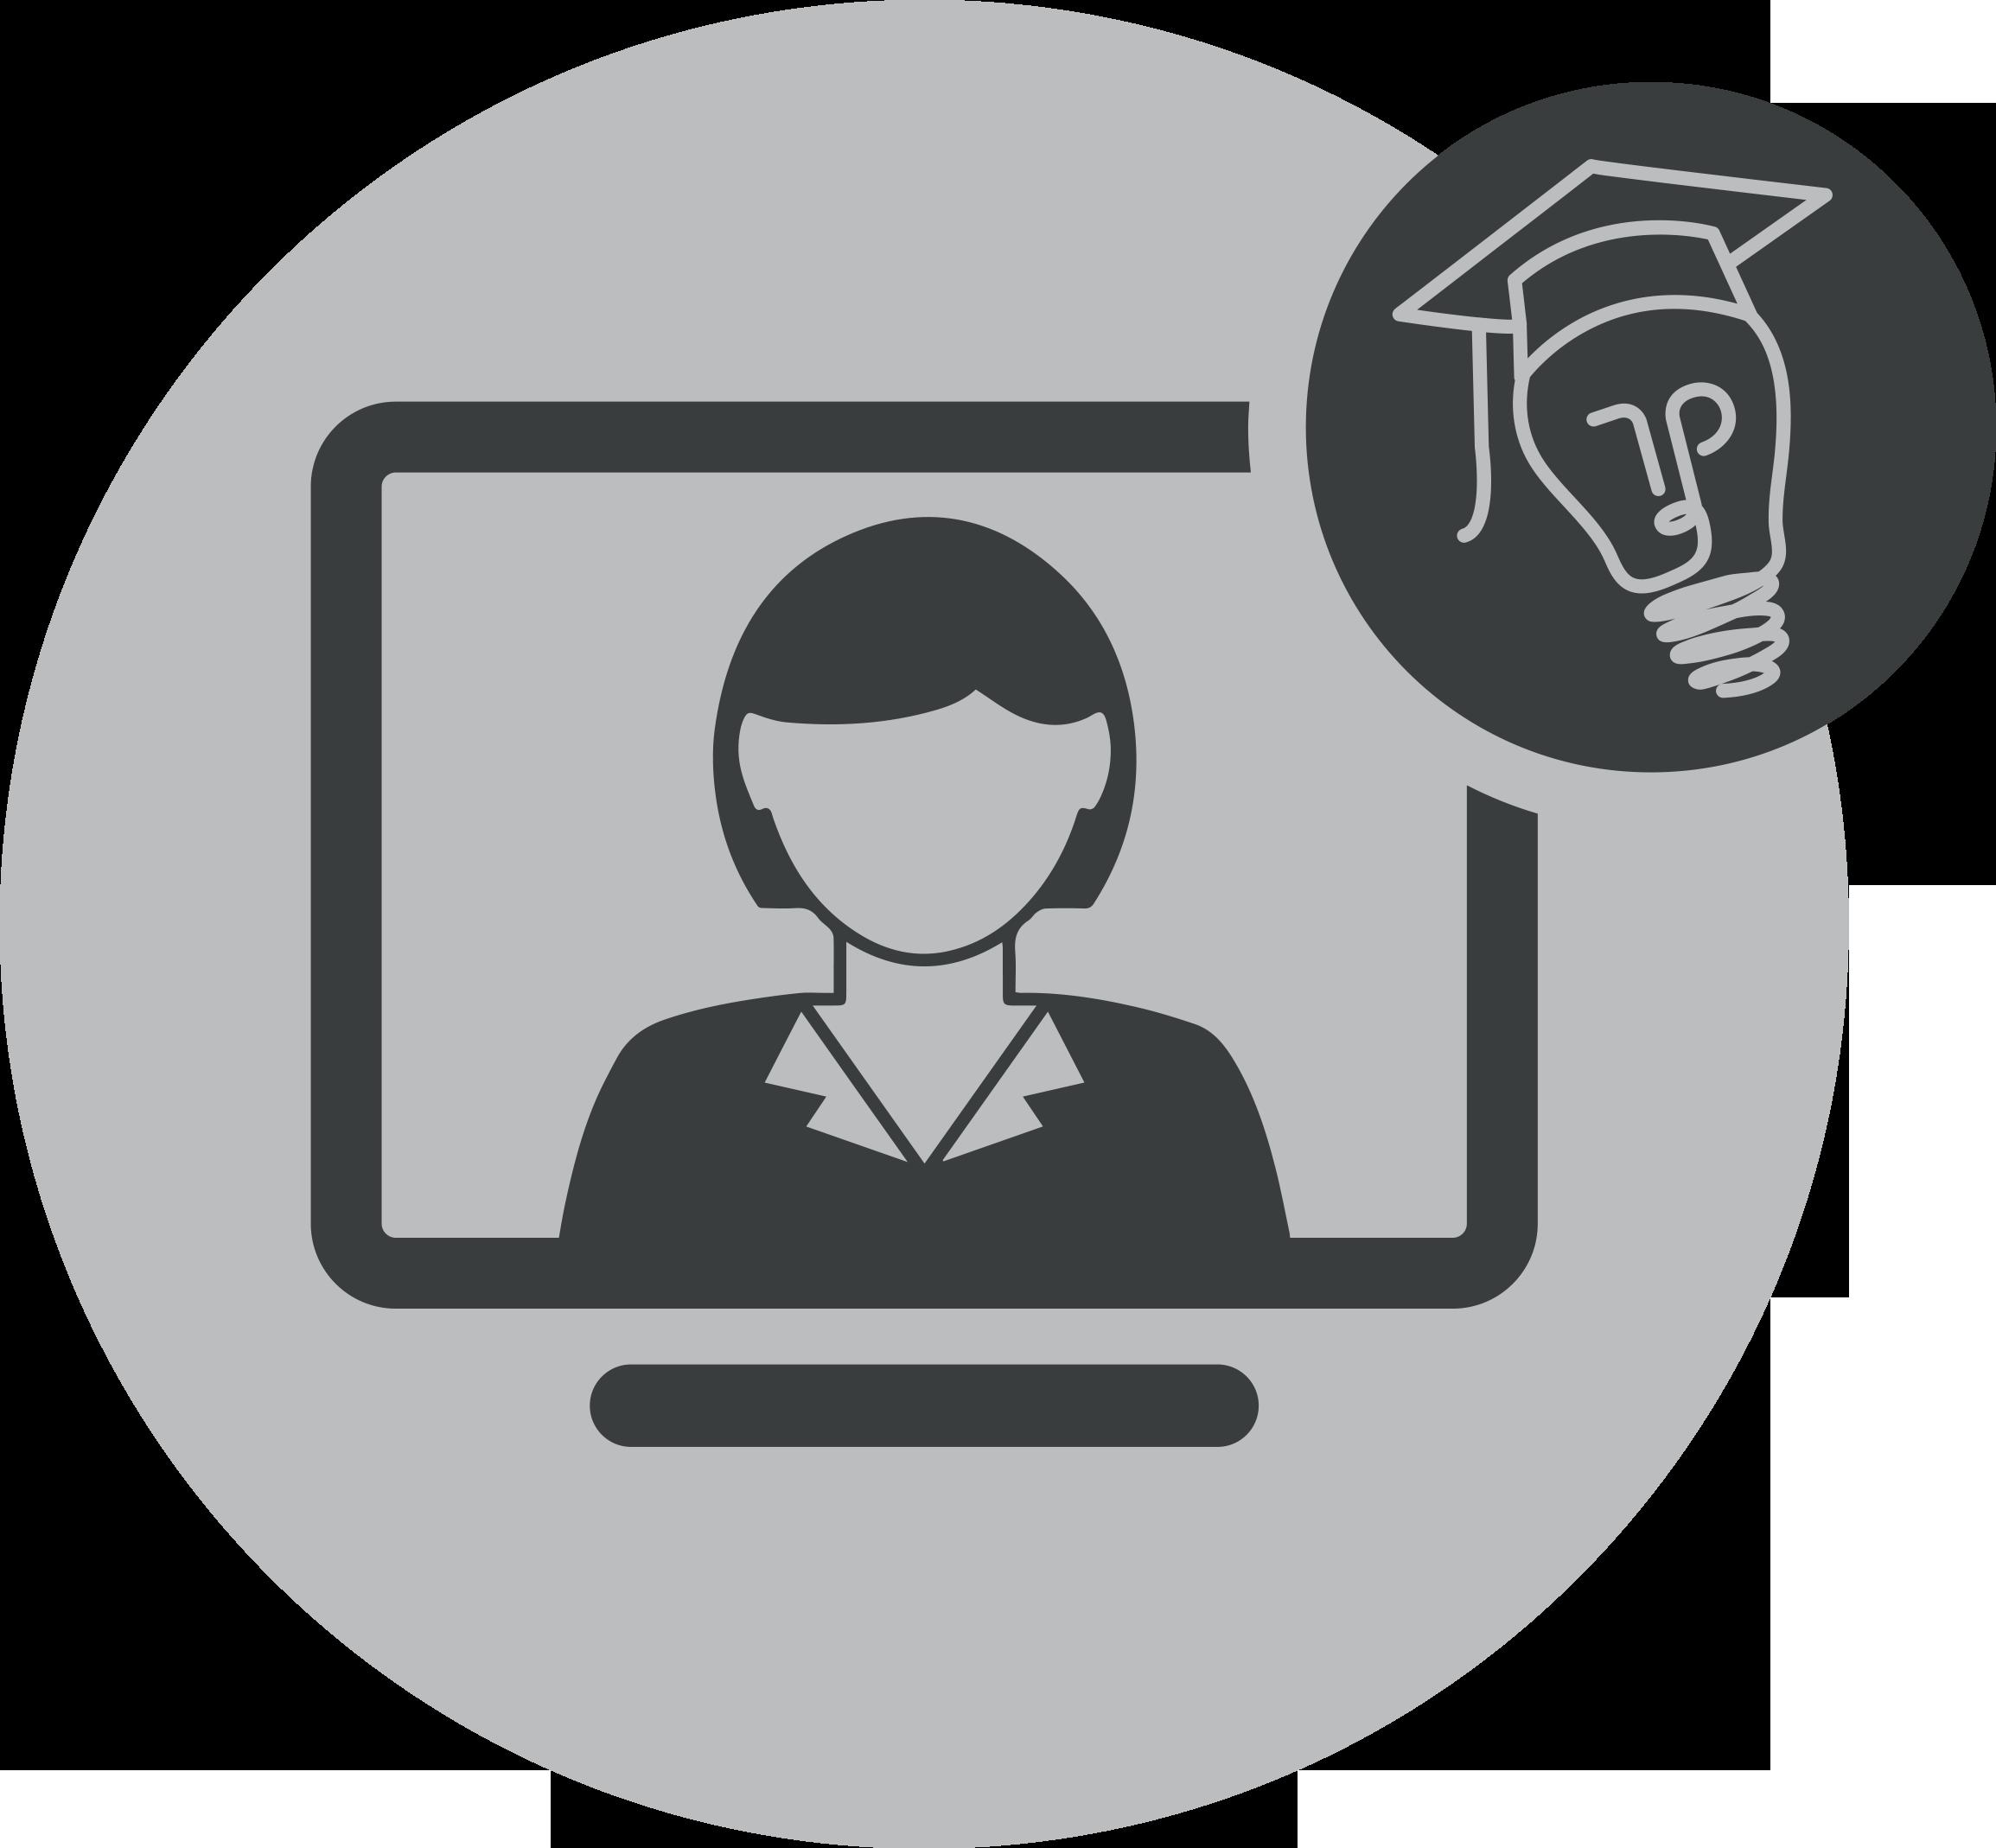 Teachpitch learn more better. Teach clipart tutoring